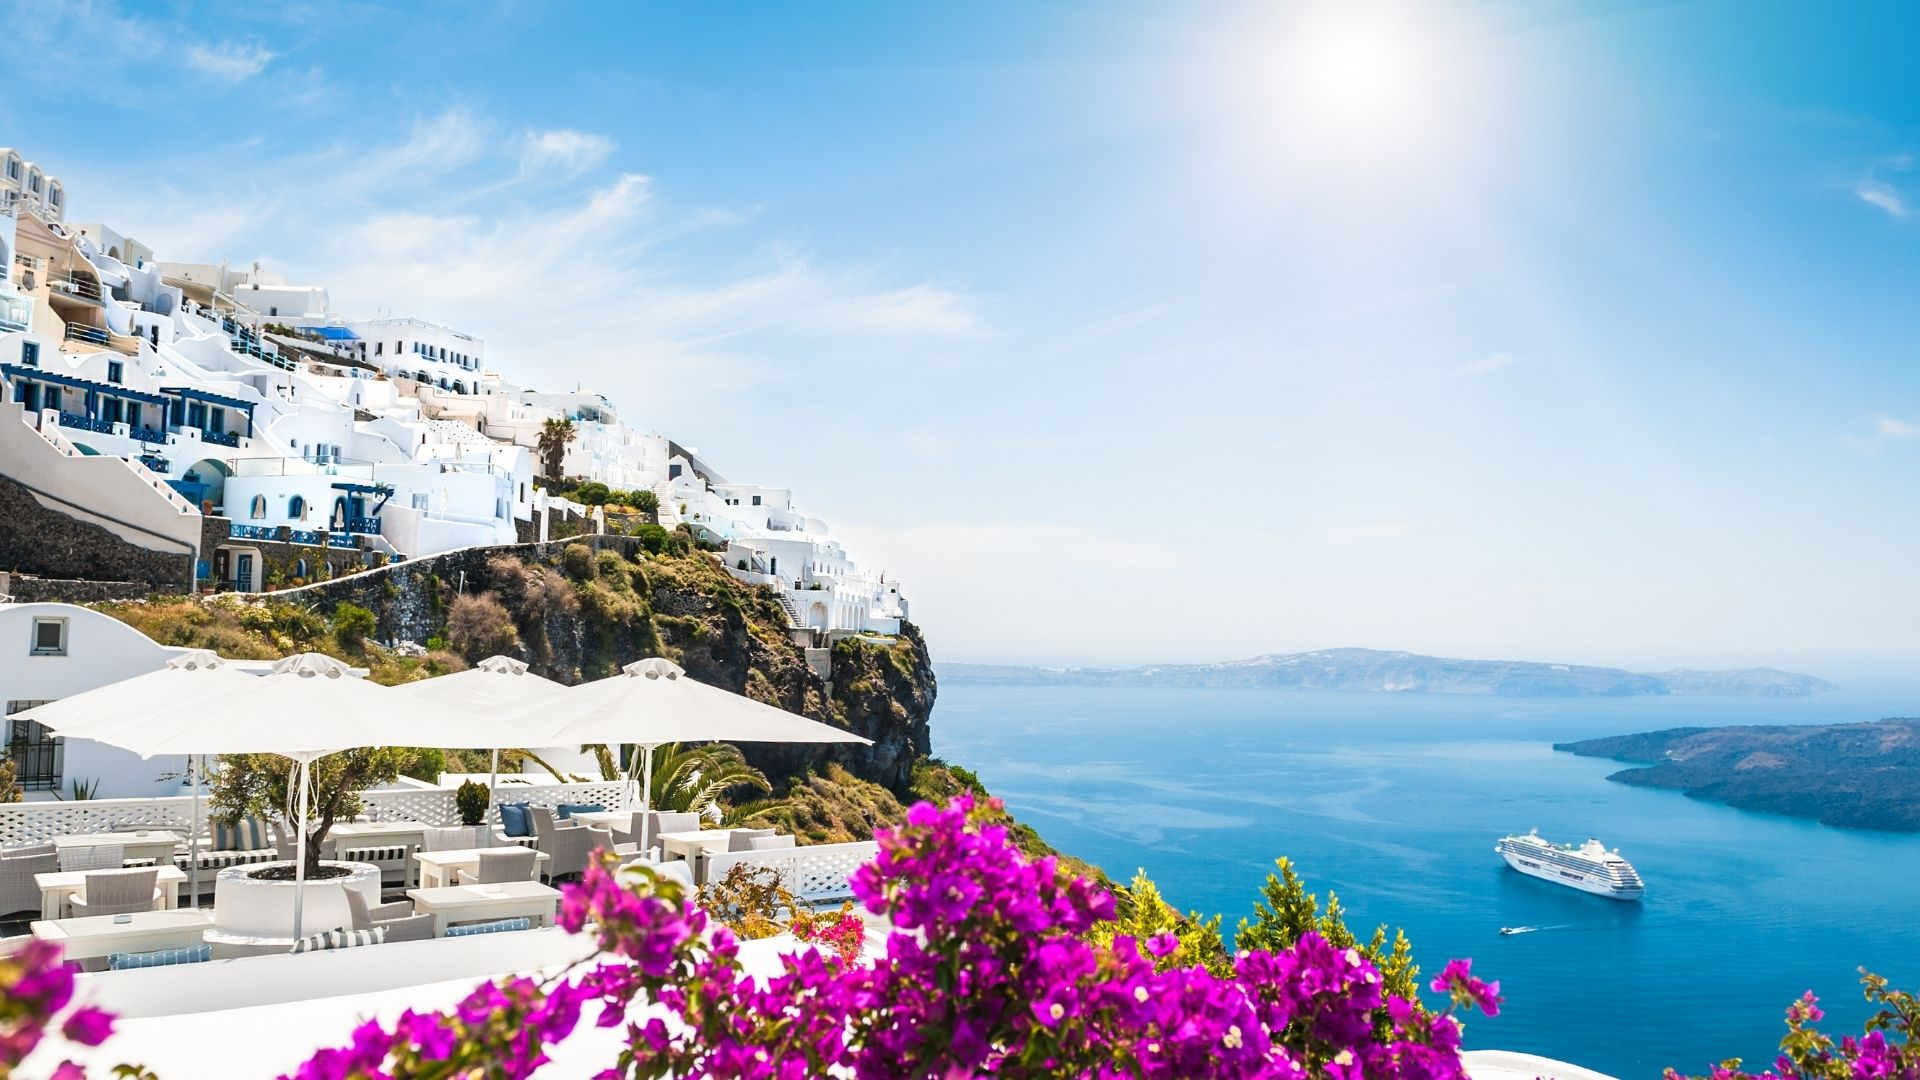 Yunanistan Vizesi: Randevu ve Başvuru (2021) 1 – yunanistan 2